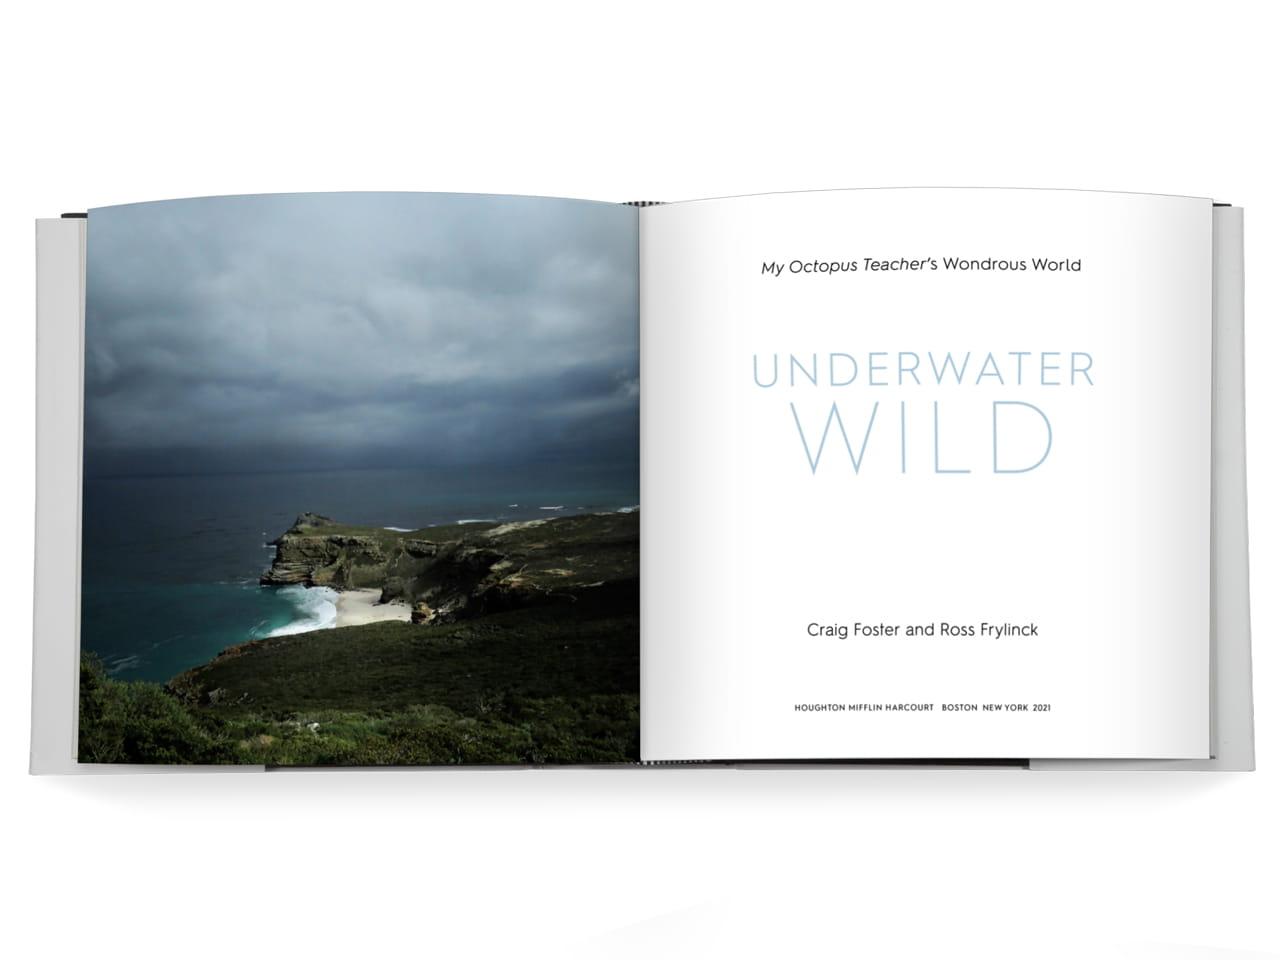 underwaterwild-book-spread-1-desktop